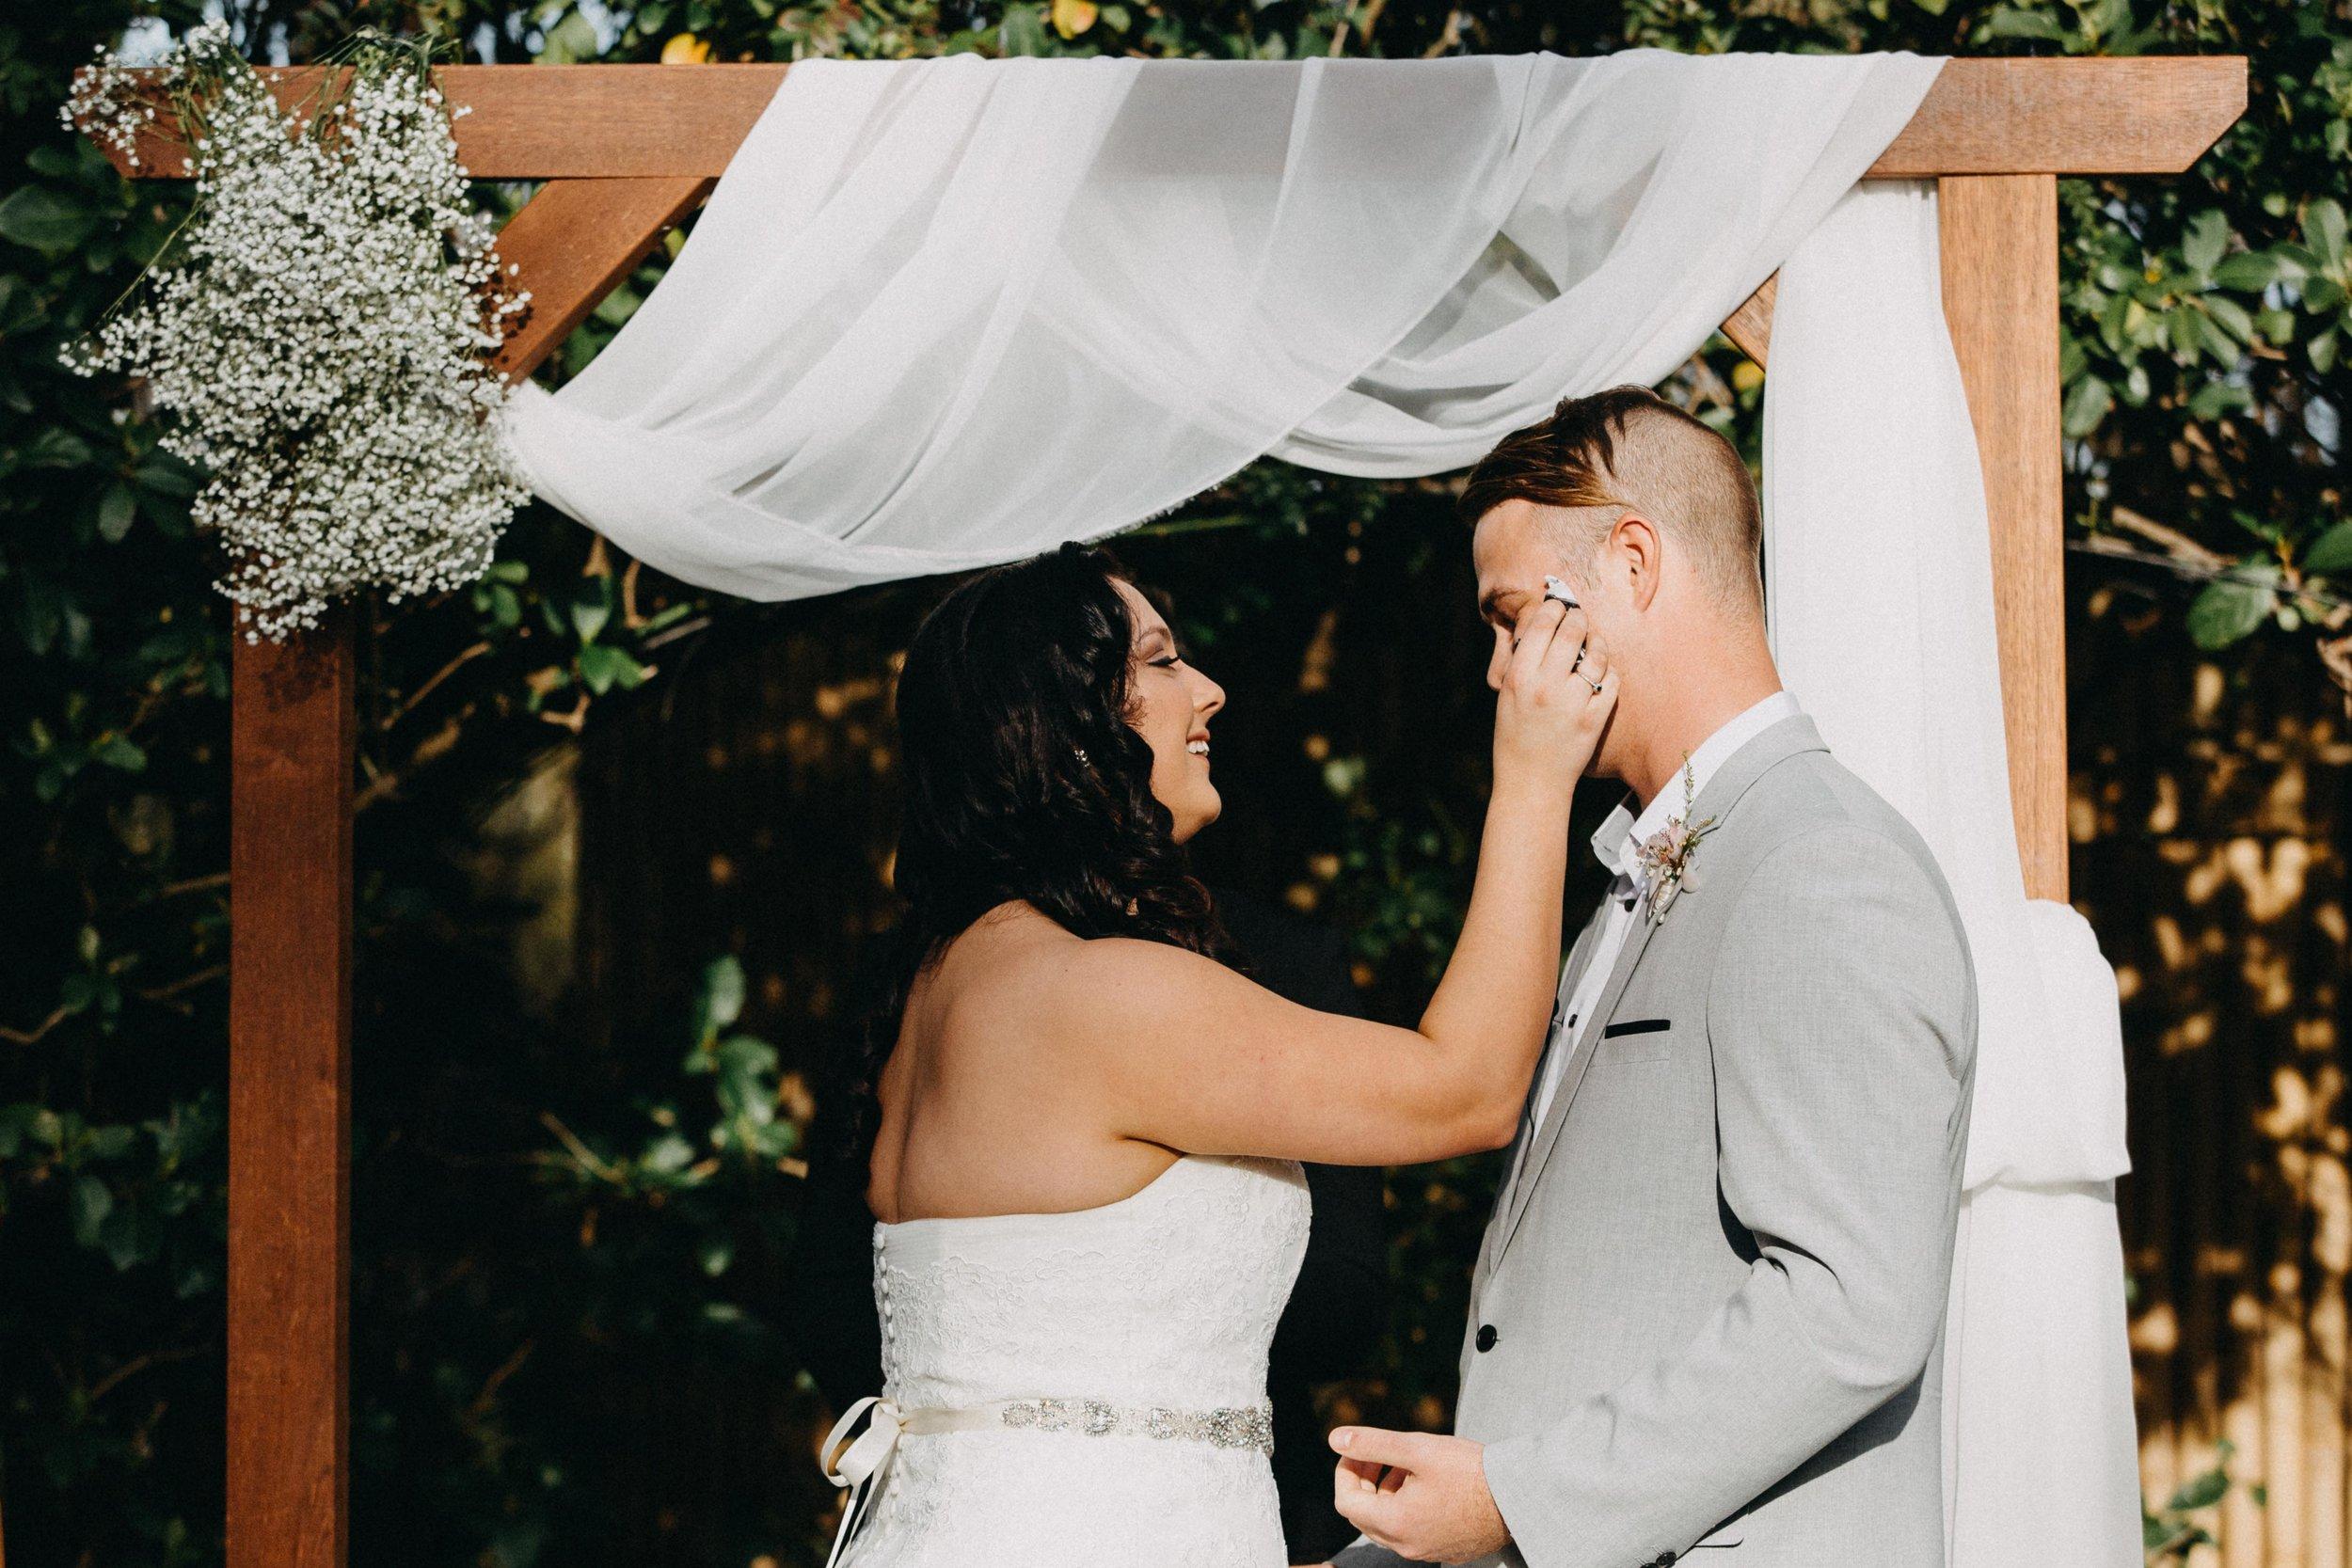 burnham-grove-camden-wedding-emilyobrienphotography-macarthur-63.jpg